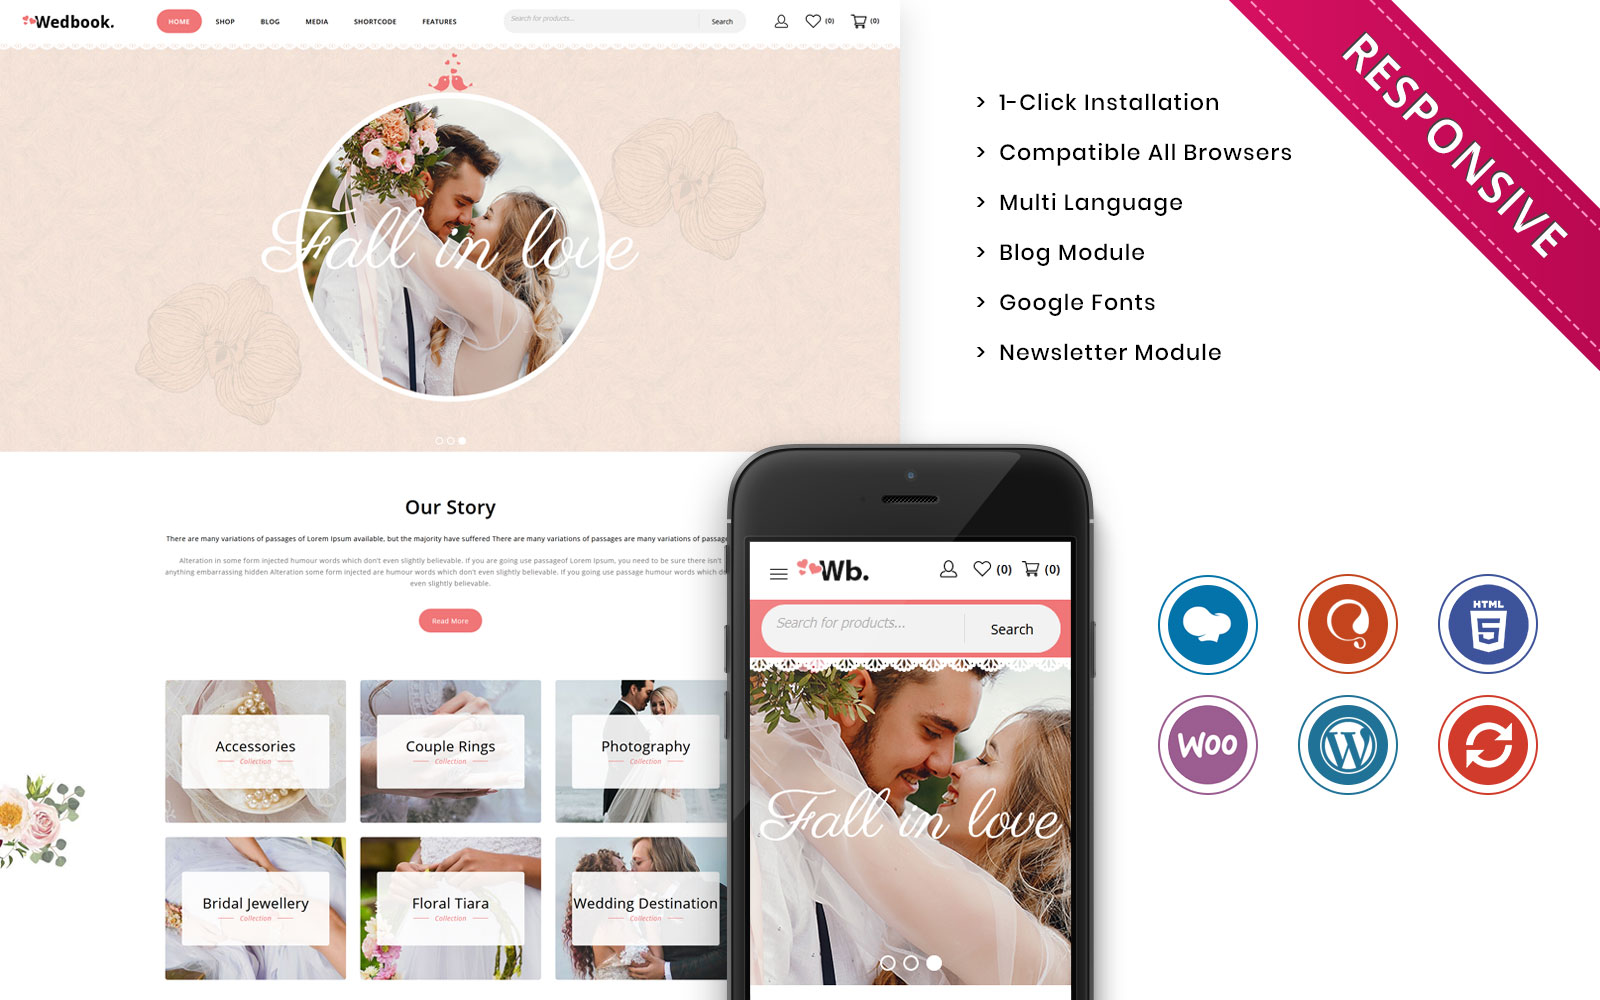 Wedbook - The Wedding Store Responsive №109594